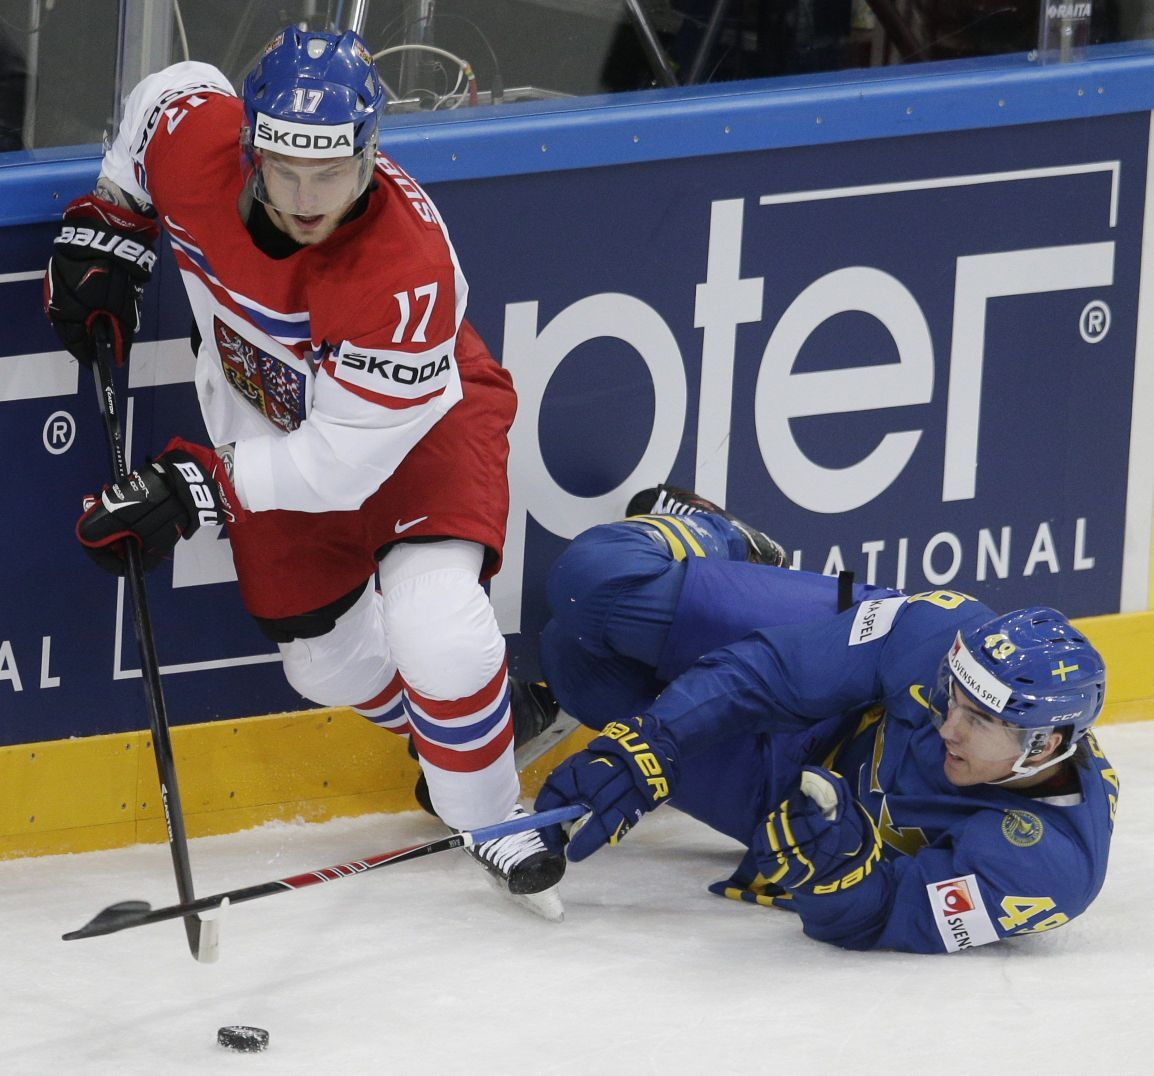 Czech Republic Hockey Worlds